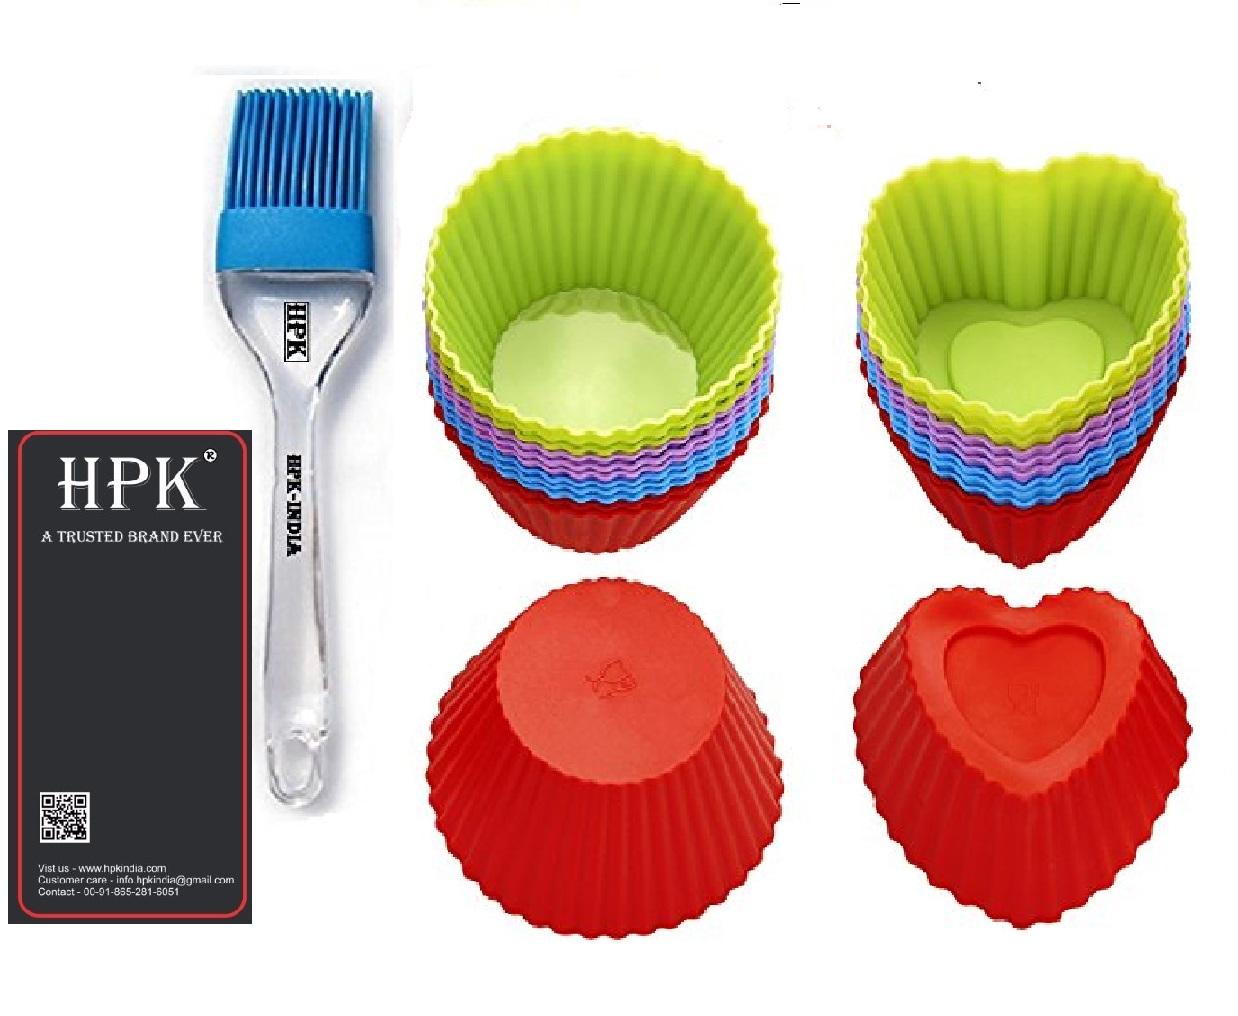 hpk-brsuh heart round  molds Set